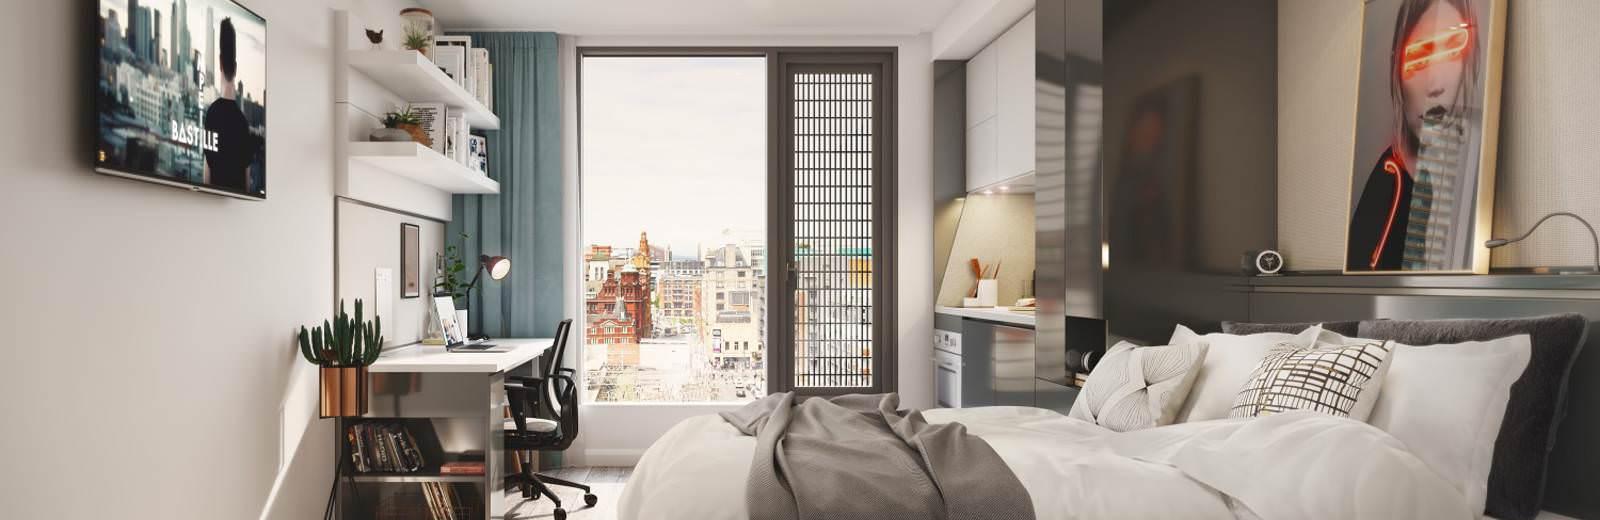 vita student circle square manchester student. Black Bedroom Furniture Sets. Home Design Ideas